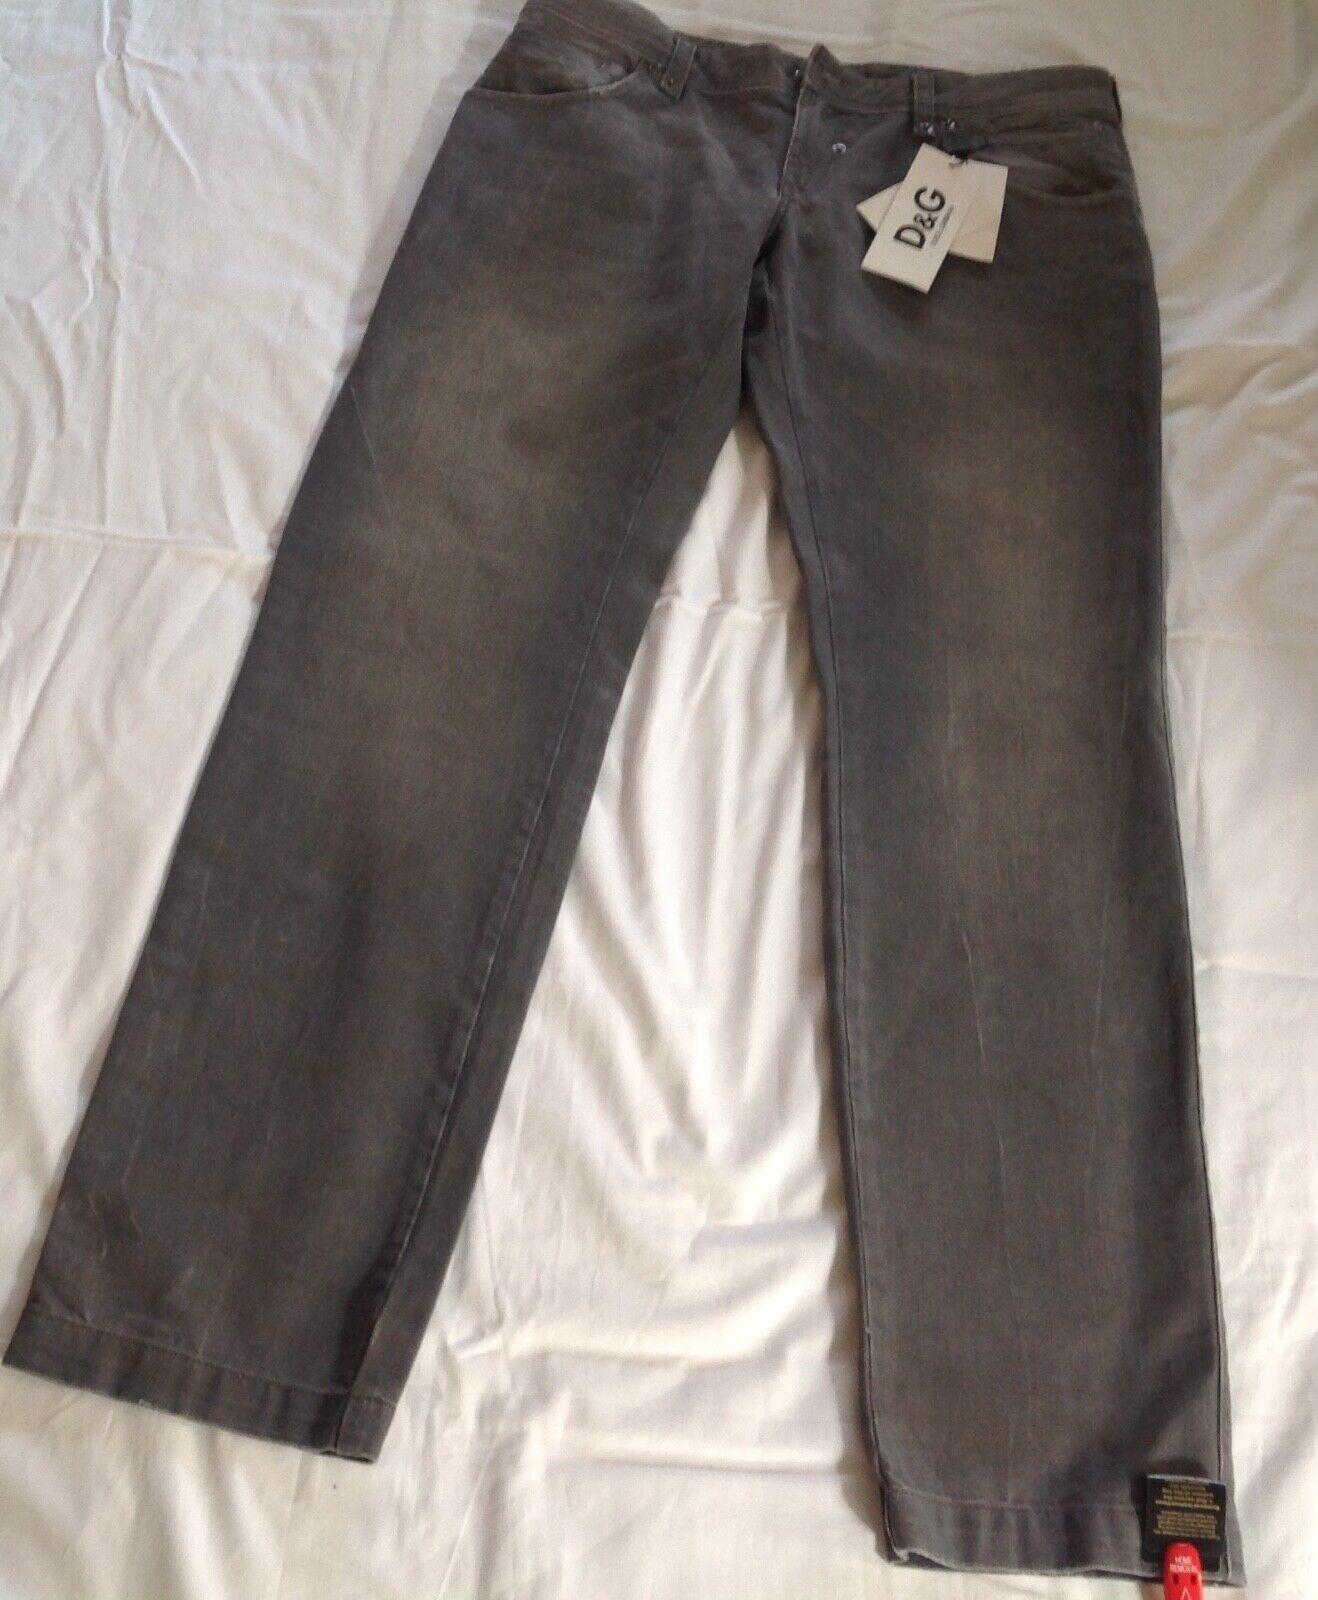 DOLCE&GABBANA Men's grau Distressed Straight Leg Jeans. Größe 34